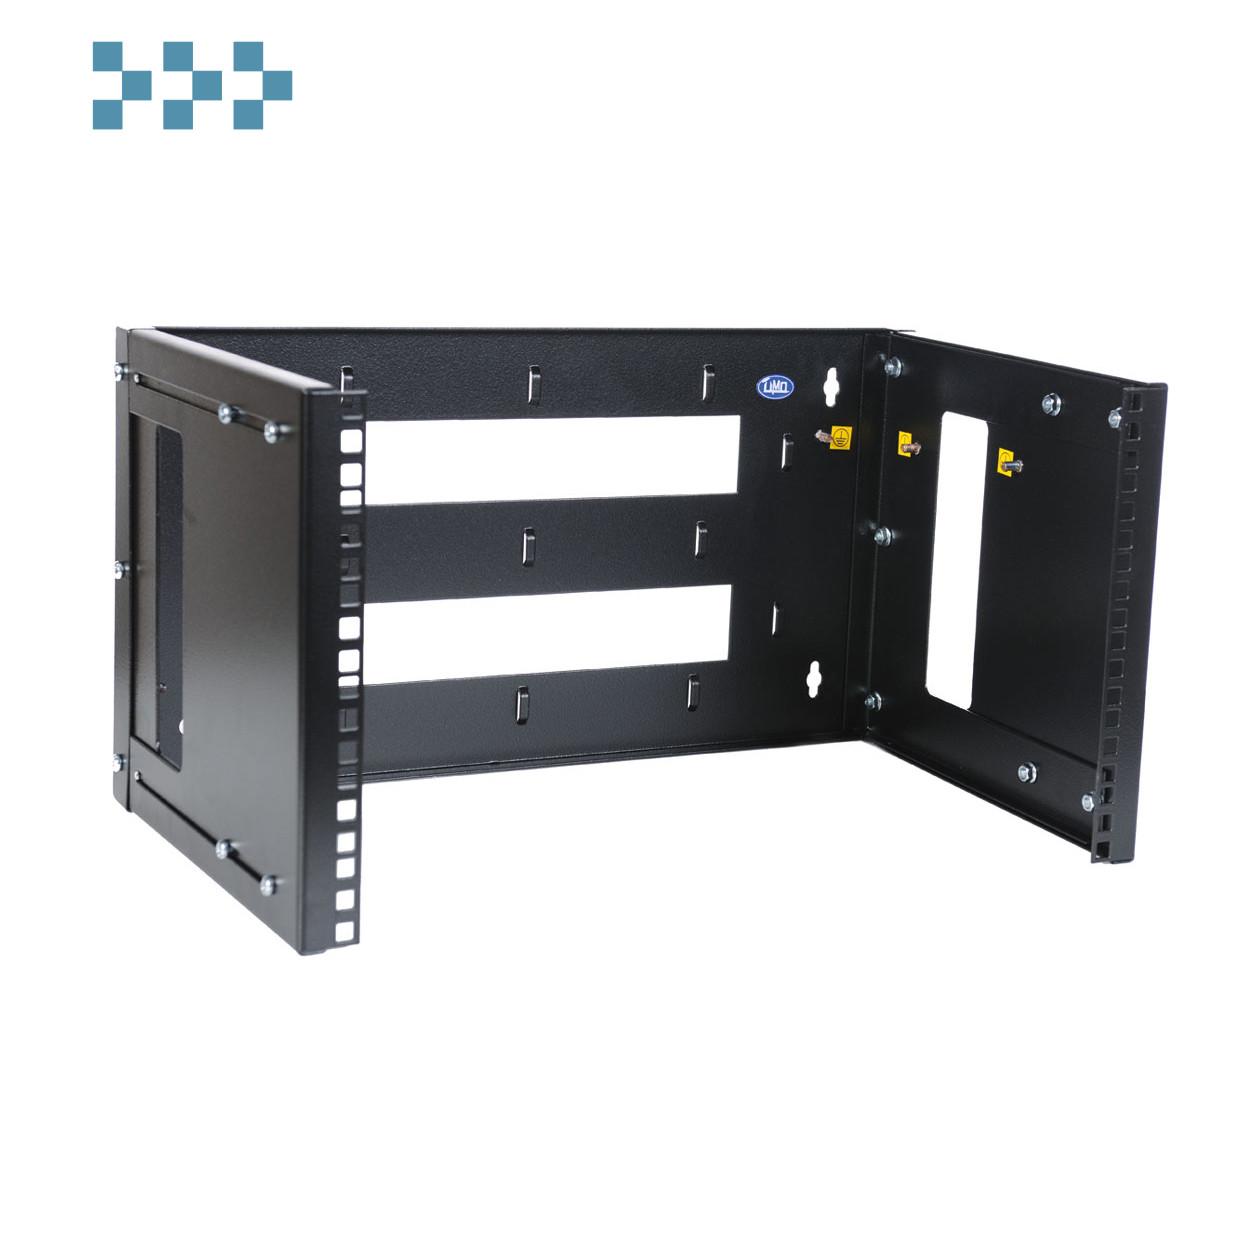 Кронштейн телекоммуникационный настенный 3U ЦМО КНО-М-3U-9005